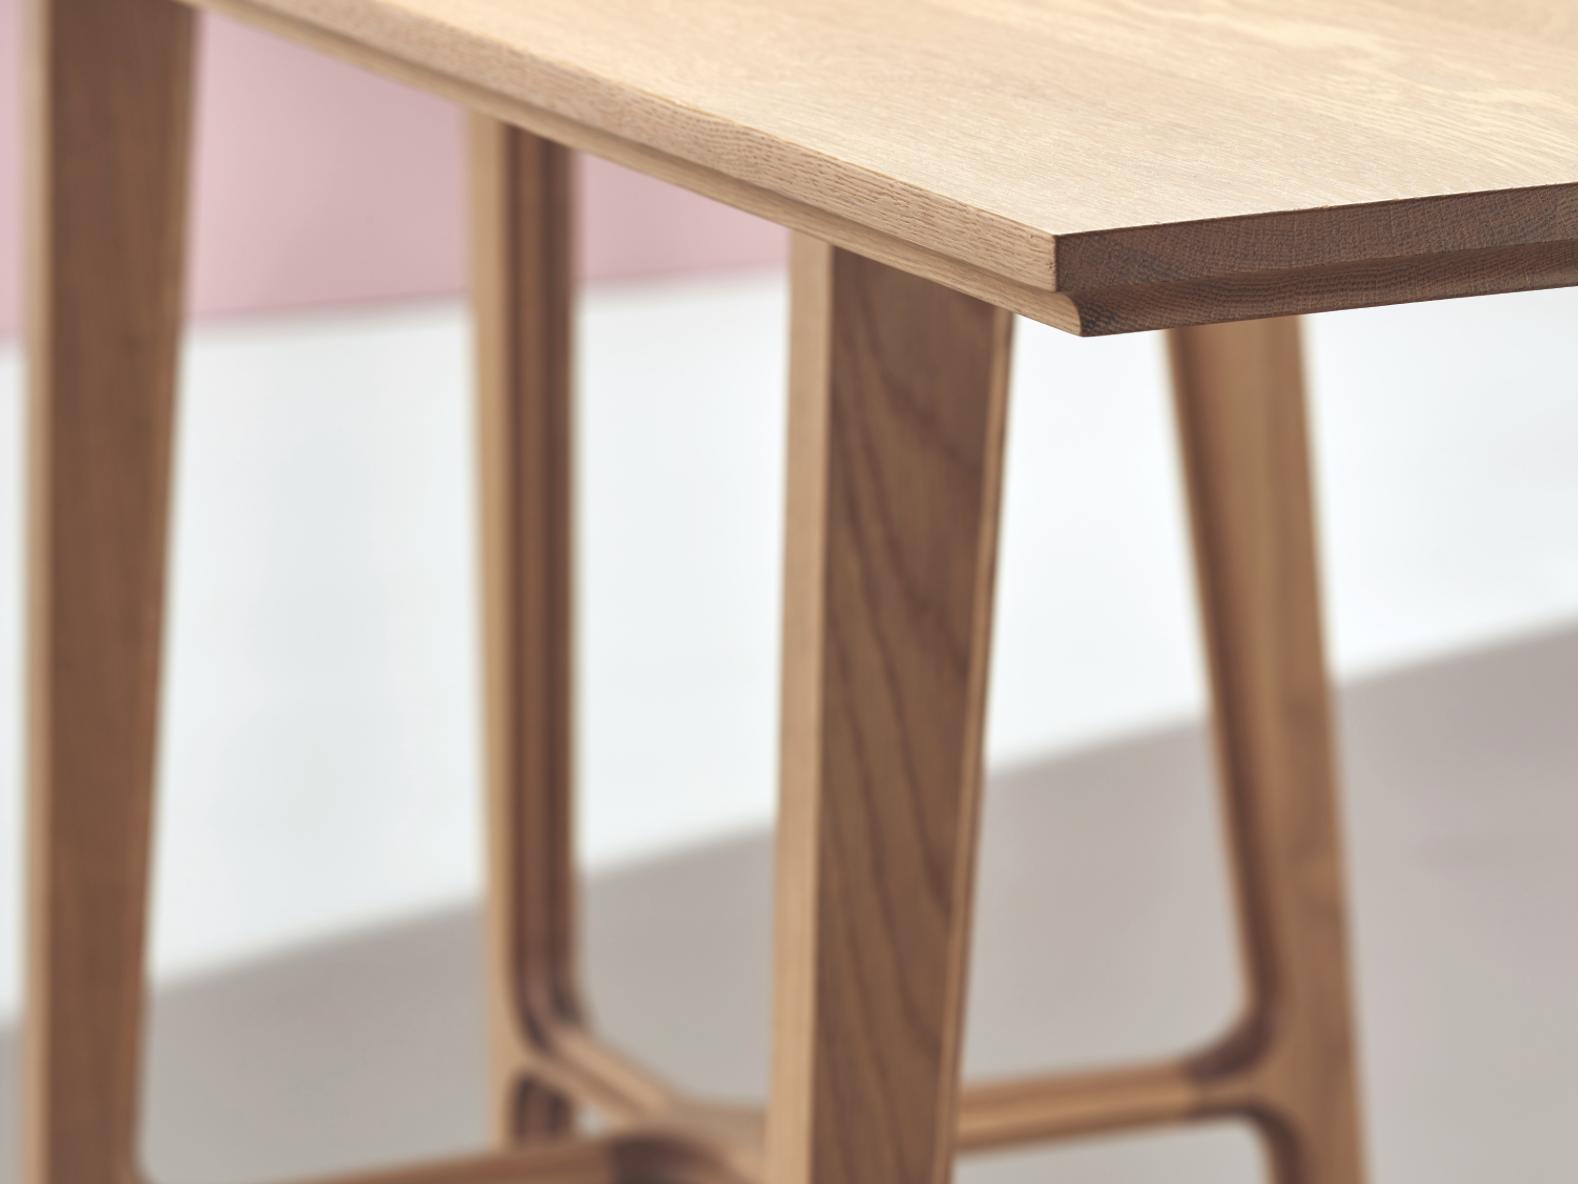 Cumberland Furniture Revo table details